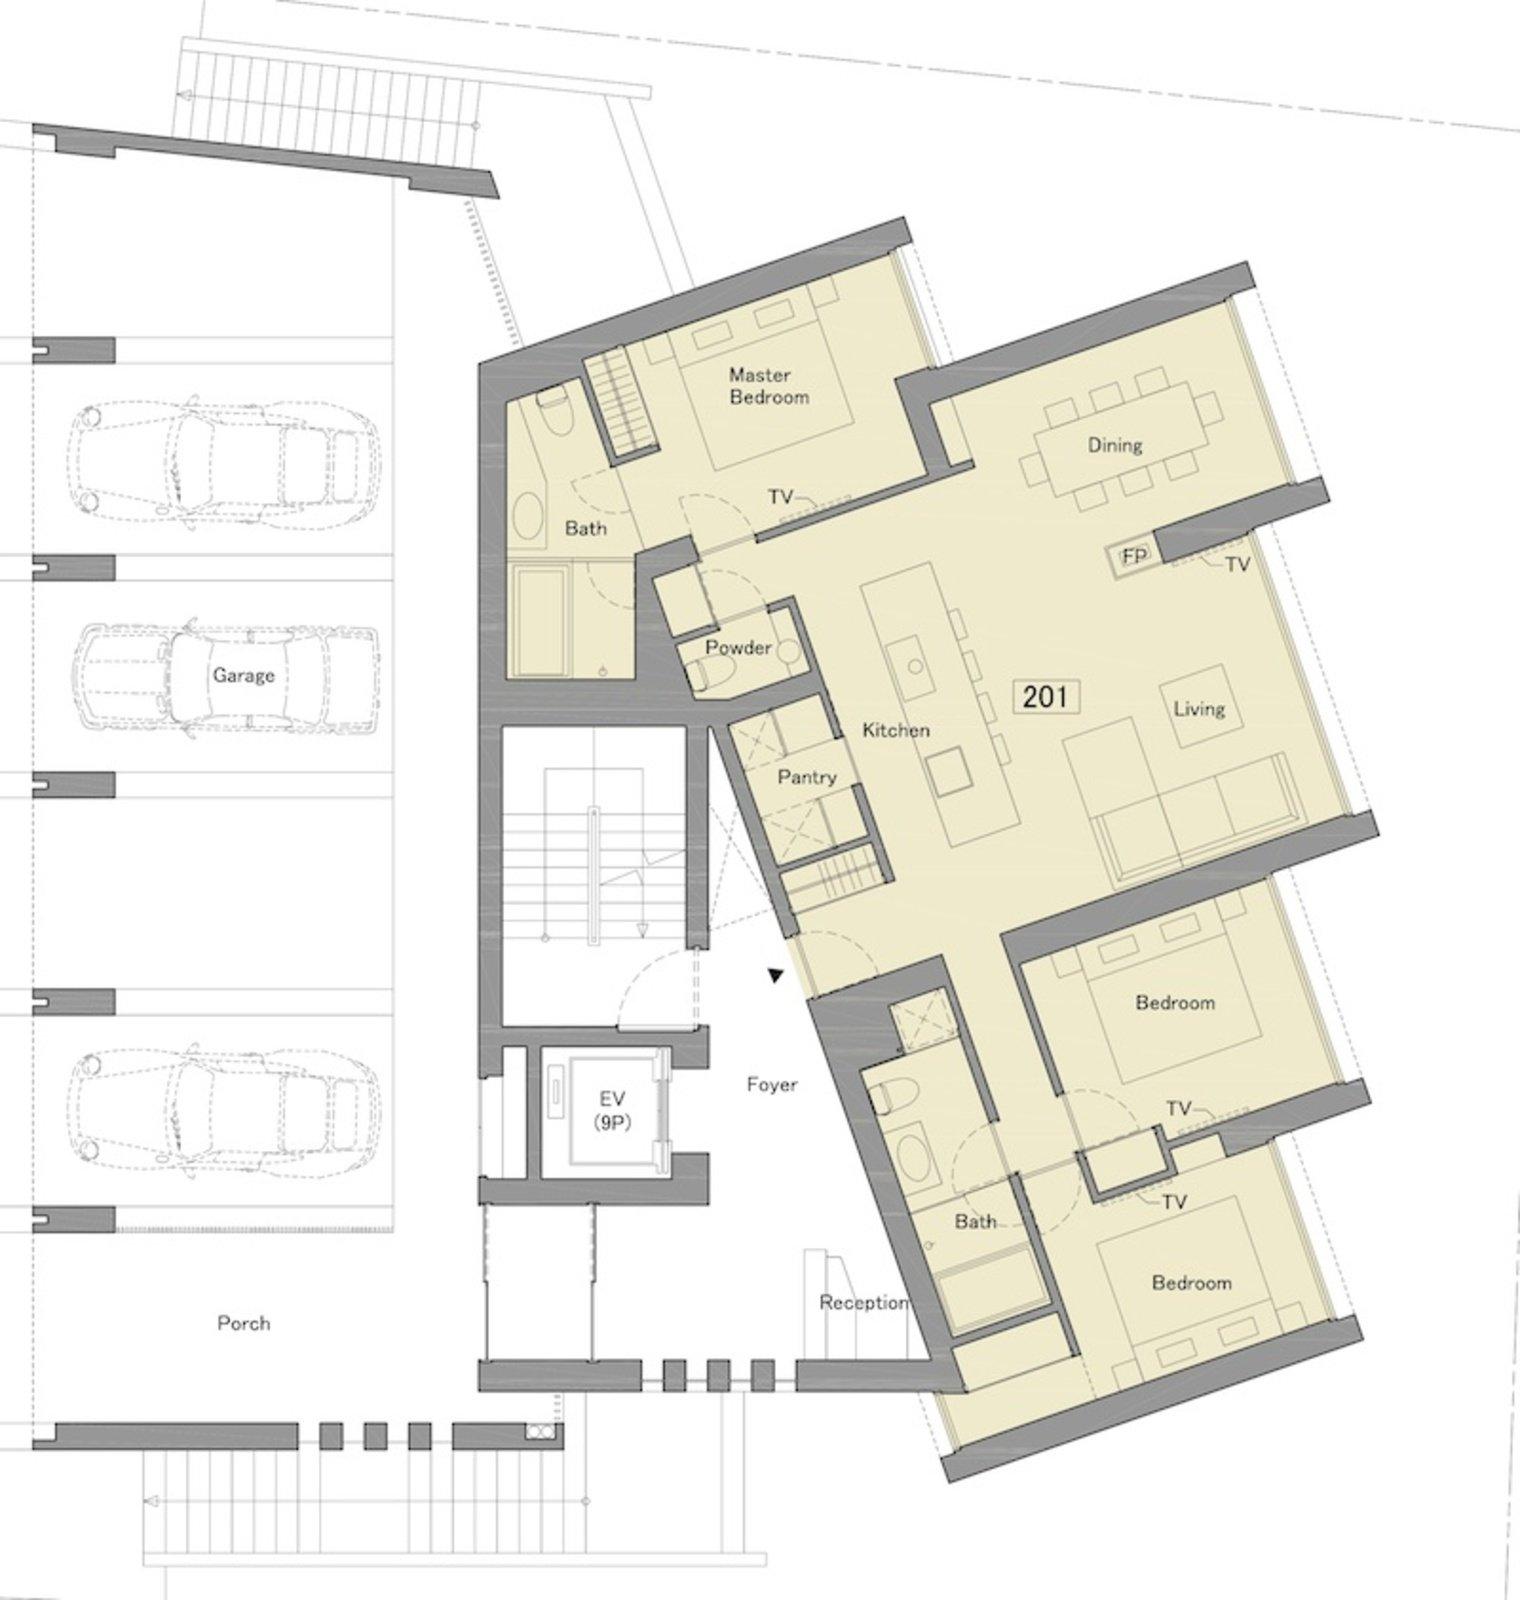 Terrazze 3 bedroom alpine view apartment 201 large